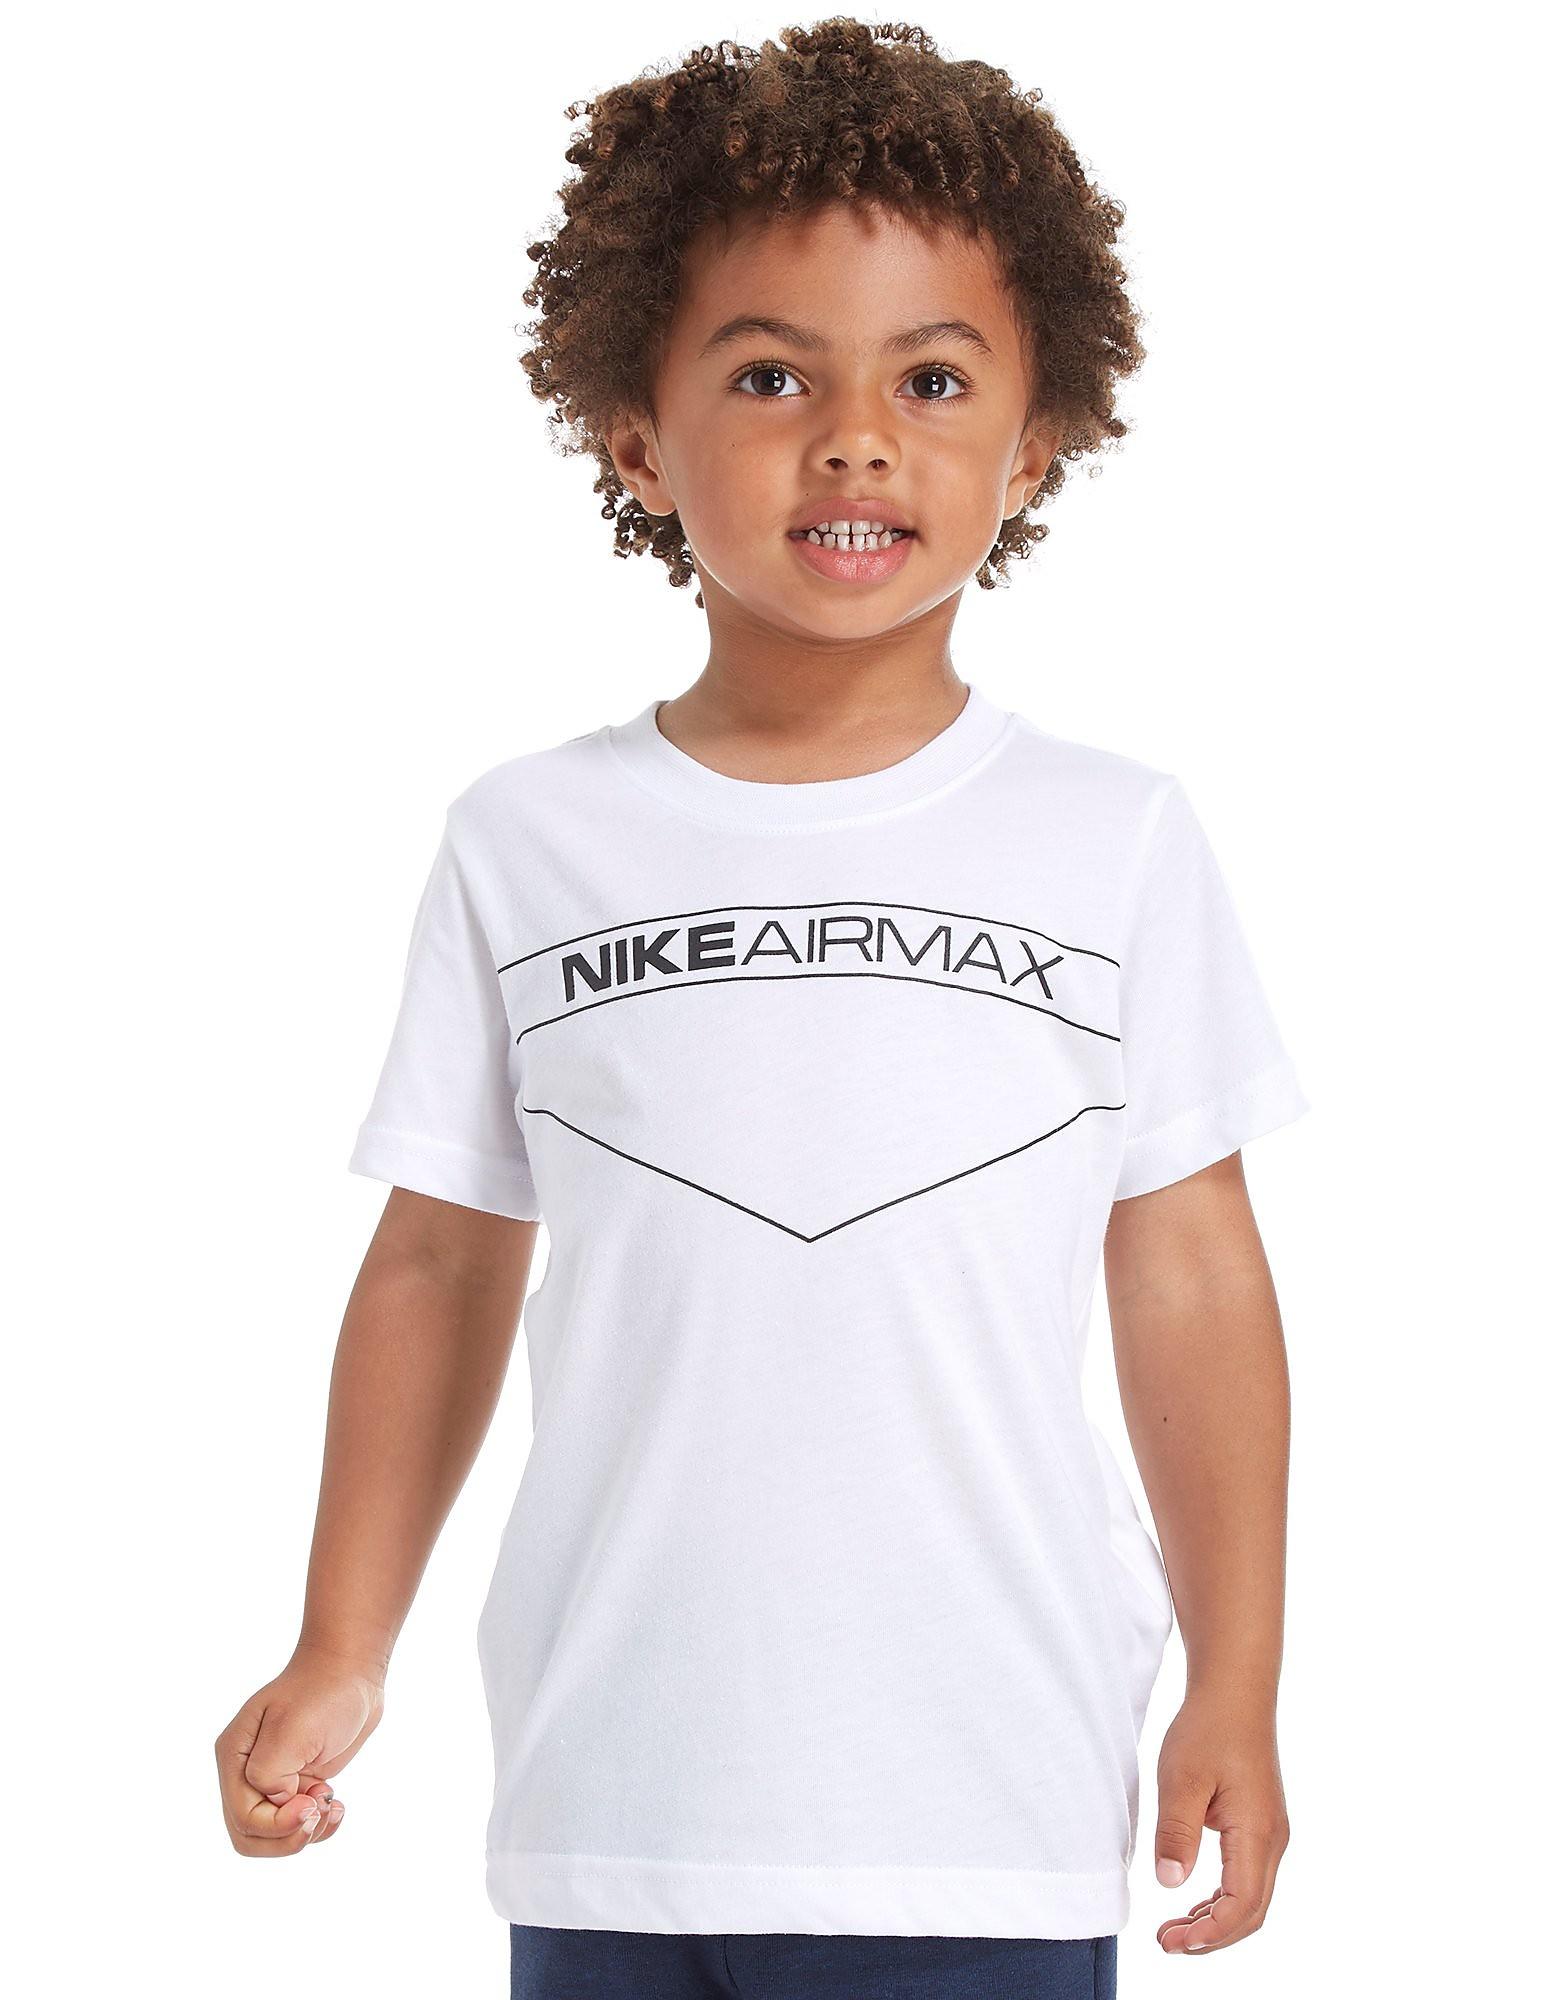 Nike Air Max T-Shirt Children  - Wit - Kind